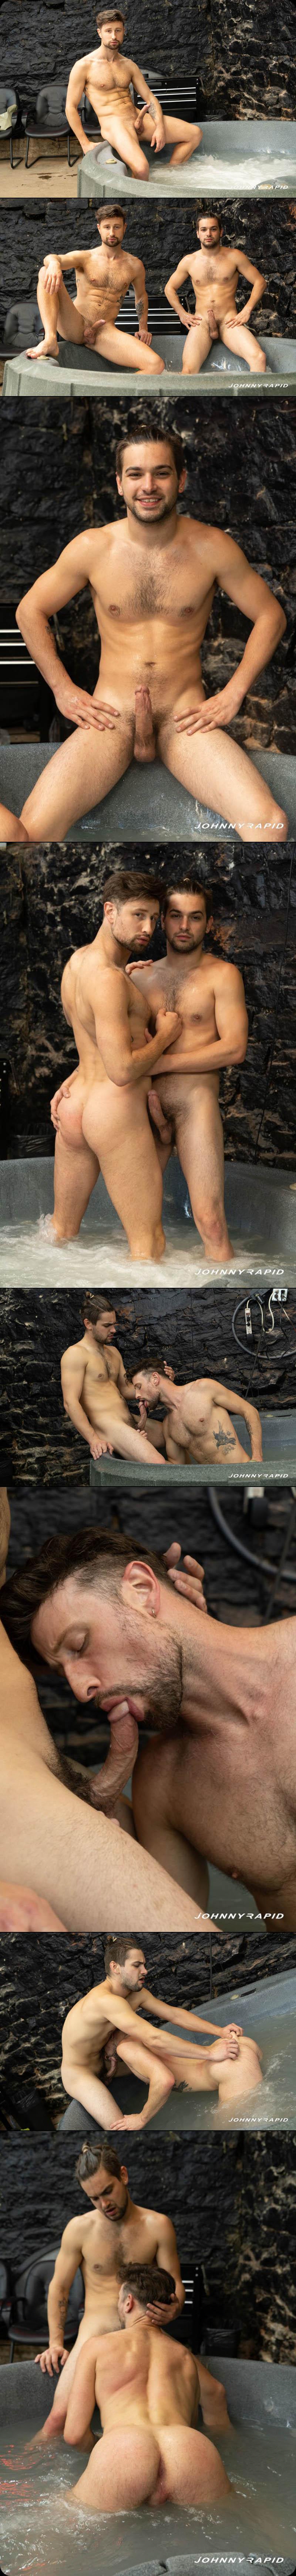 Johnny Rapid Fucks Drew Dixon in 'Hot Tub Humping' at JohnnyRapid.com